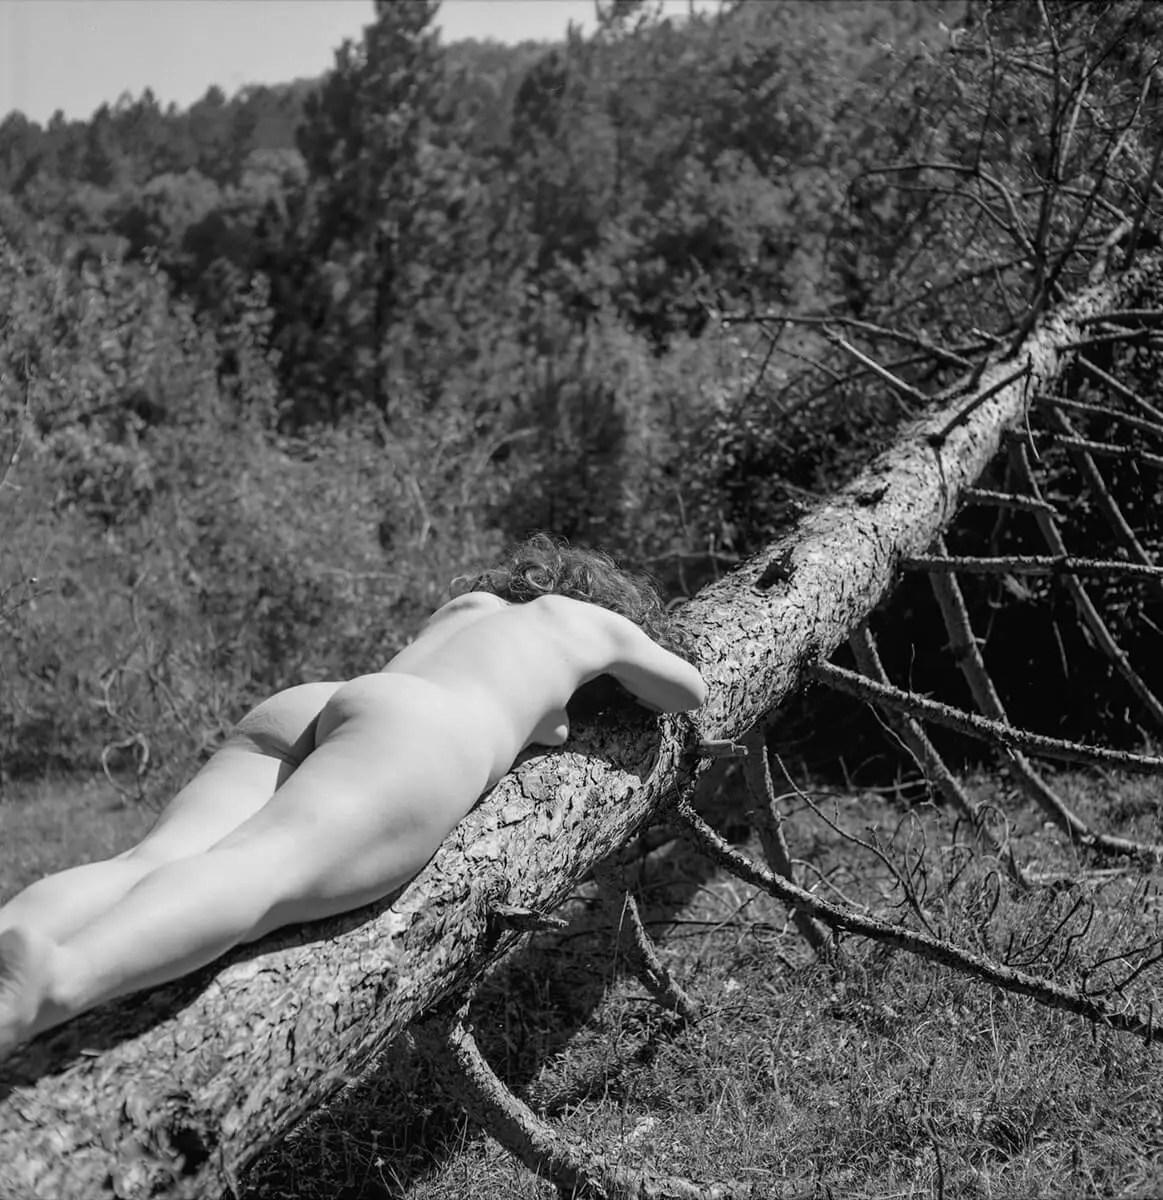 In Conversation With... Sofi Mdvinishvili - Tiblisi's analogue photography scene (NSFW) - by Neto Macedo